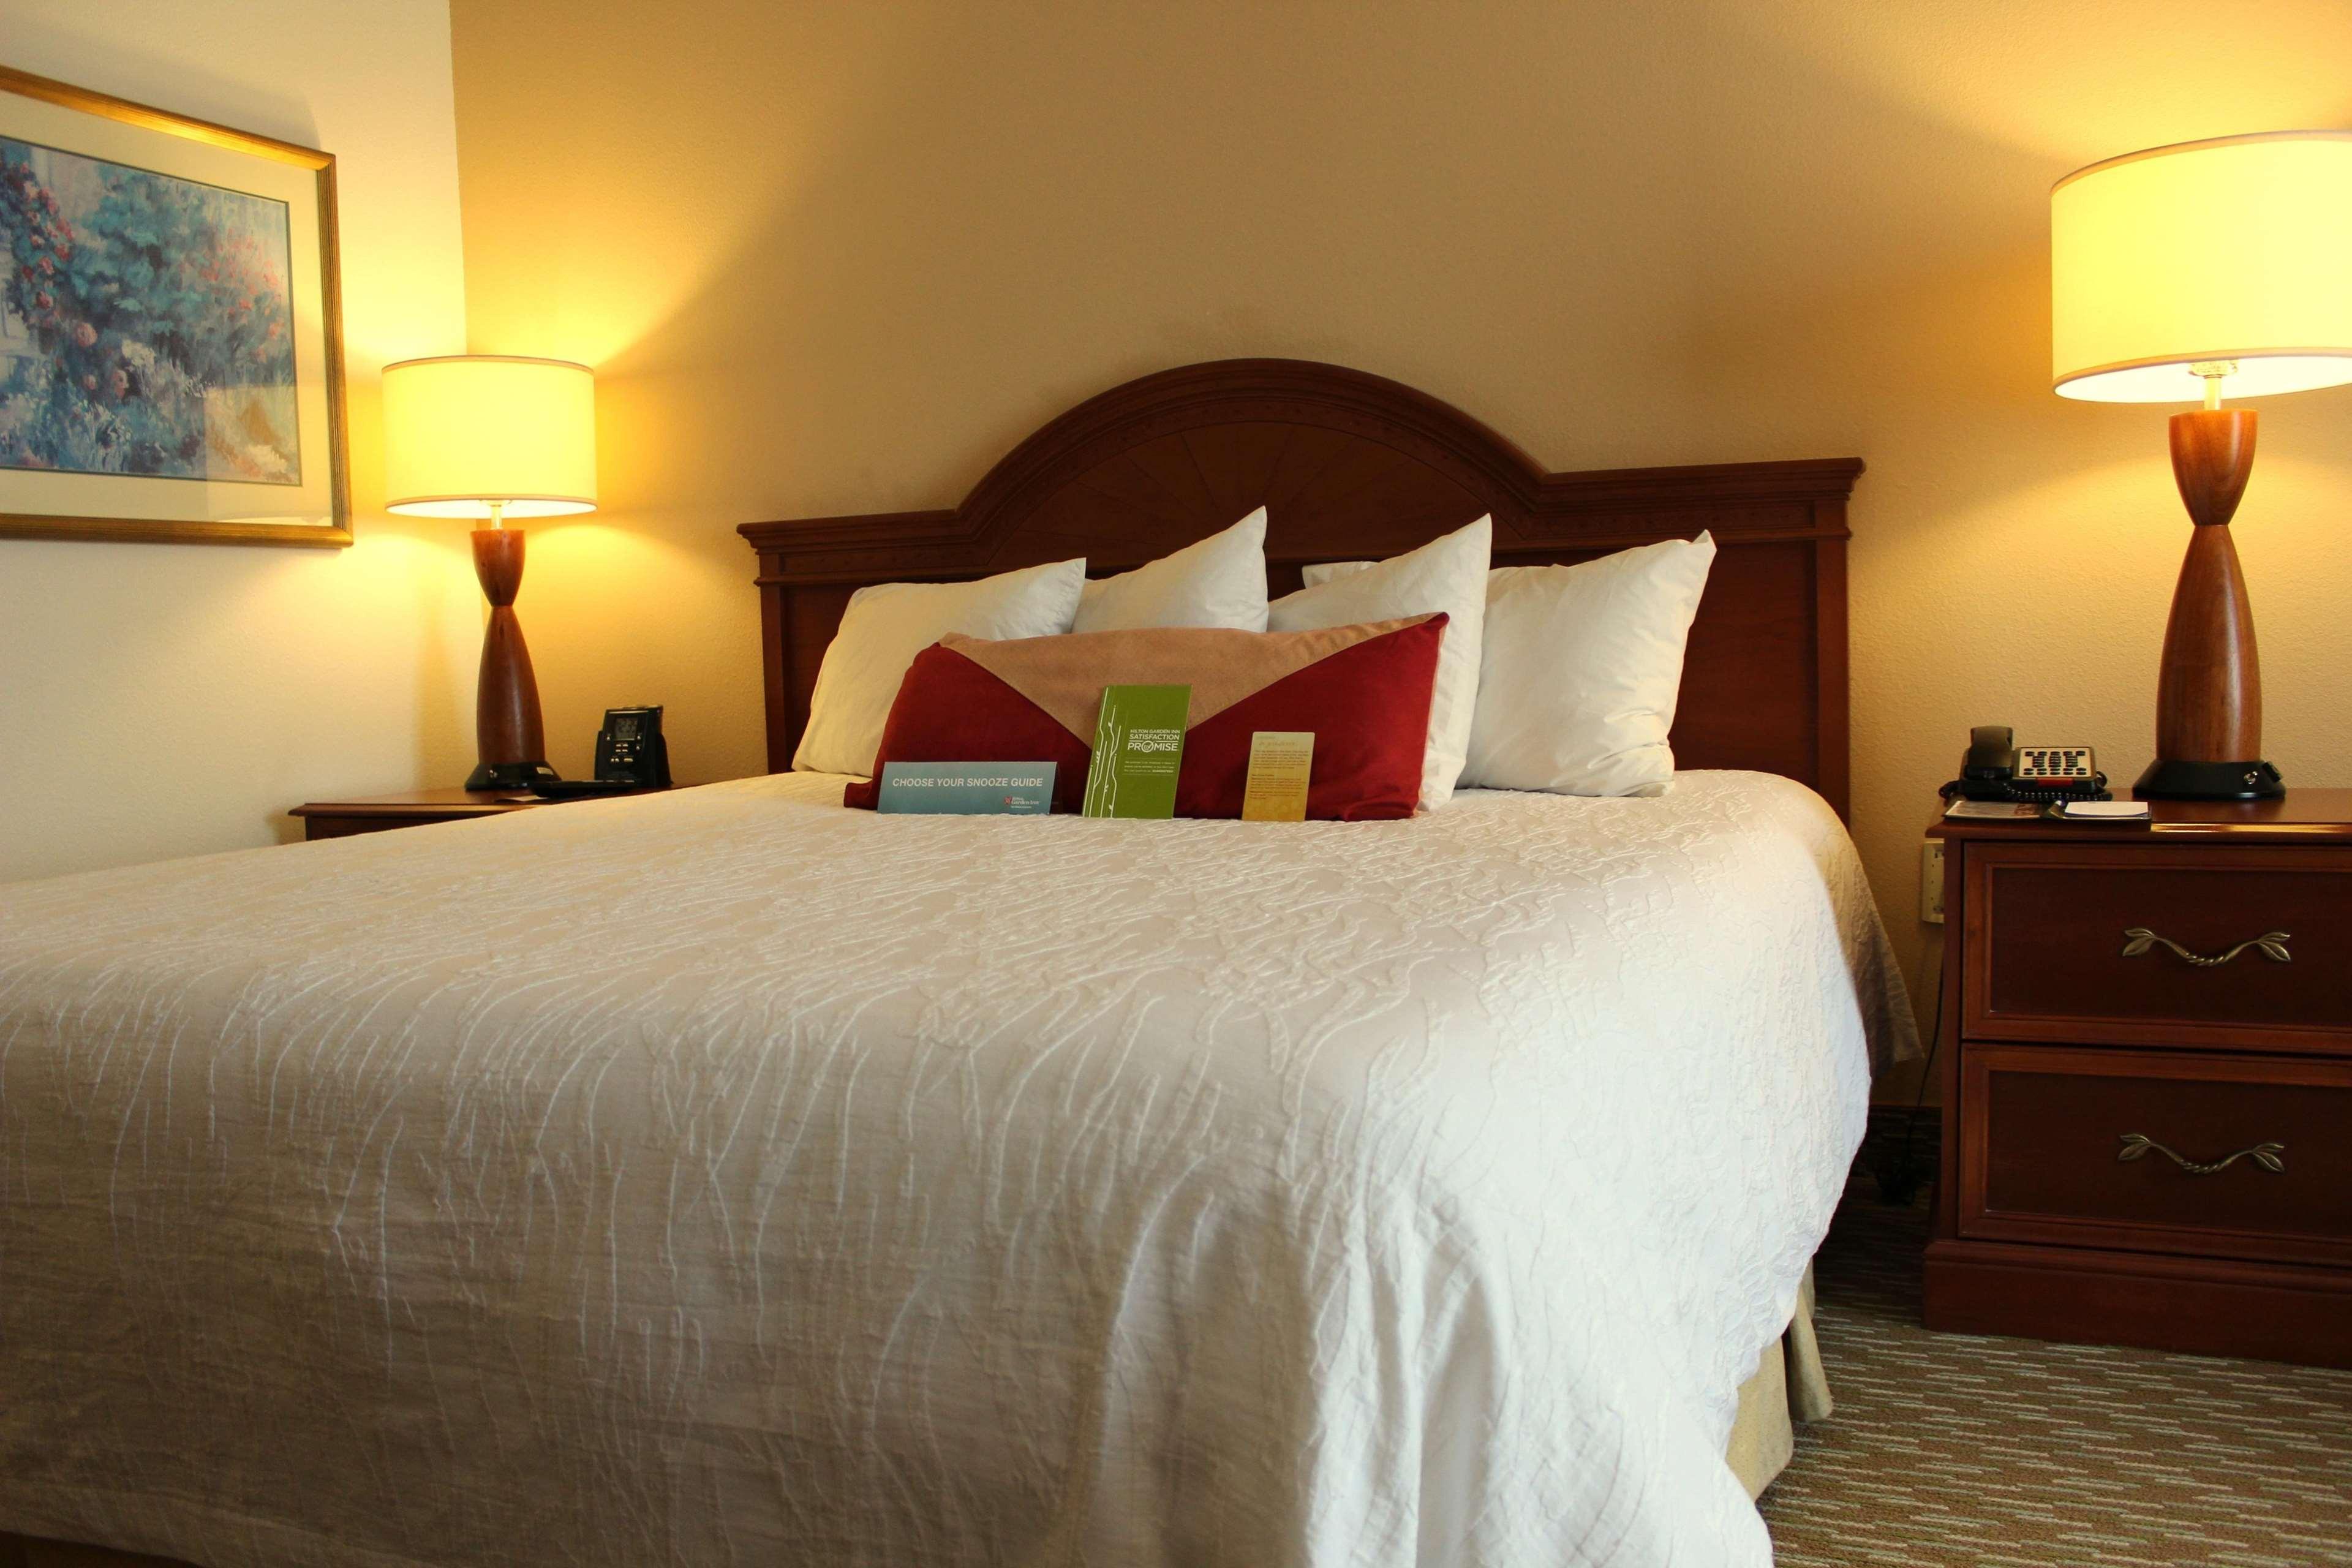 Hilton Garden Inn Charlotte Pineville 425 Towne Centre Boulevard ...